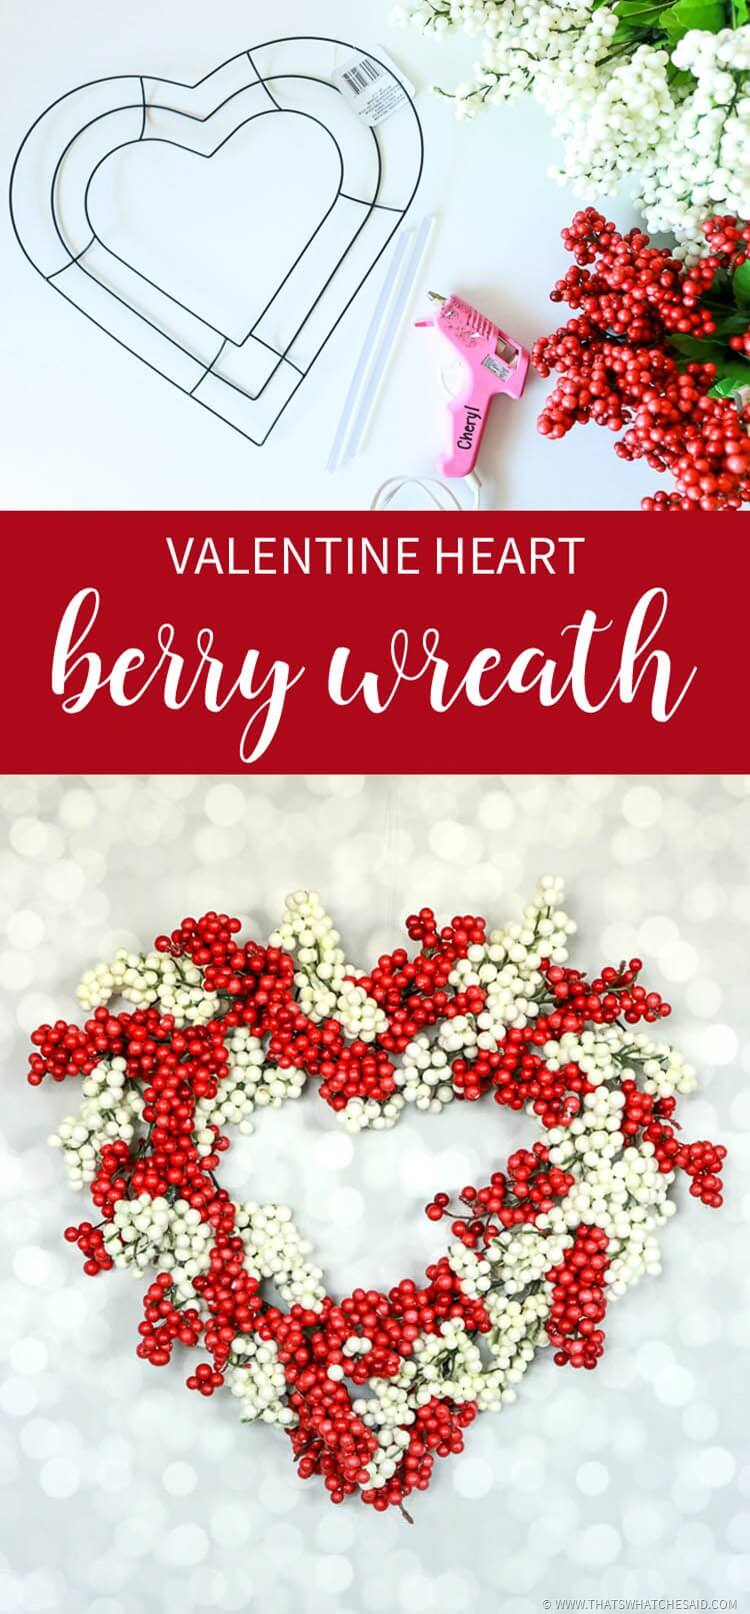 Valentine Heart Berry Wreath from Dollar Store Supplies